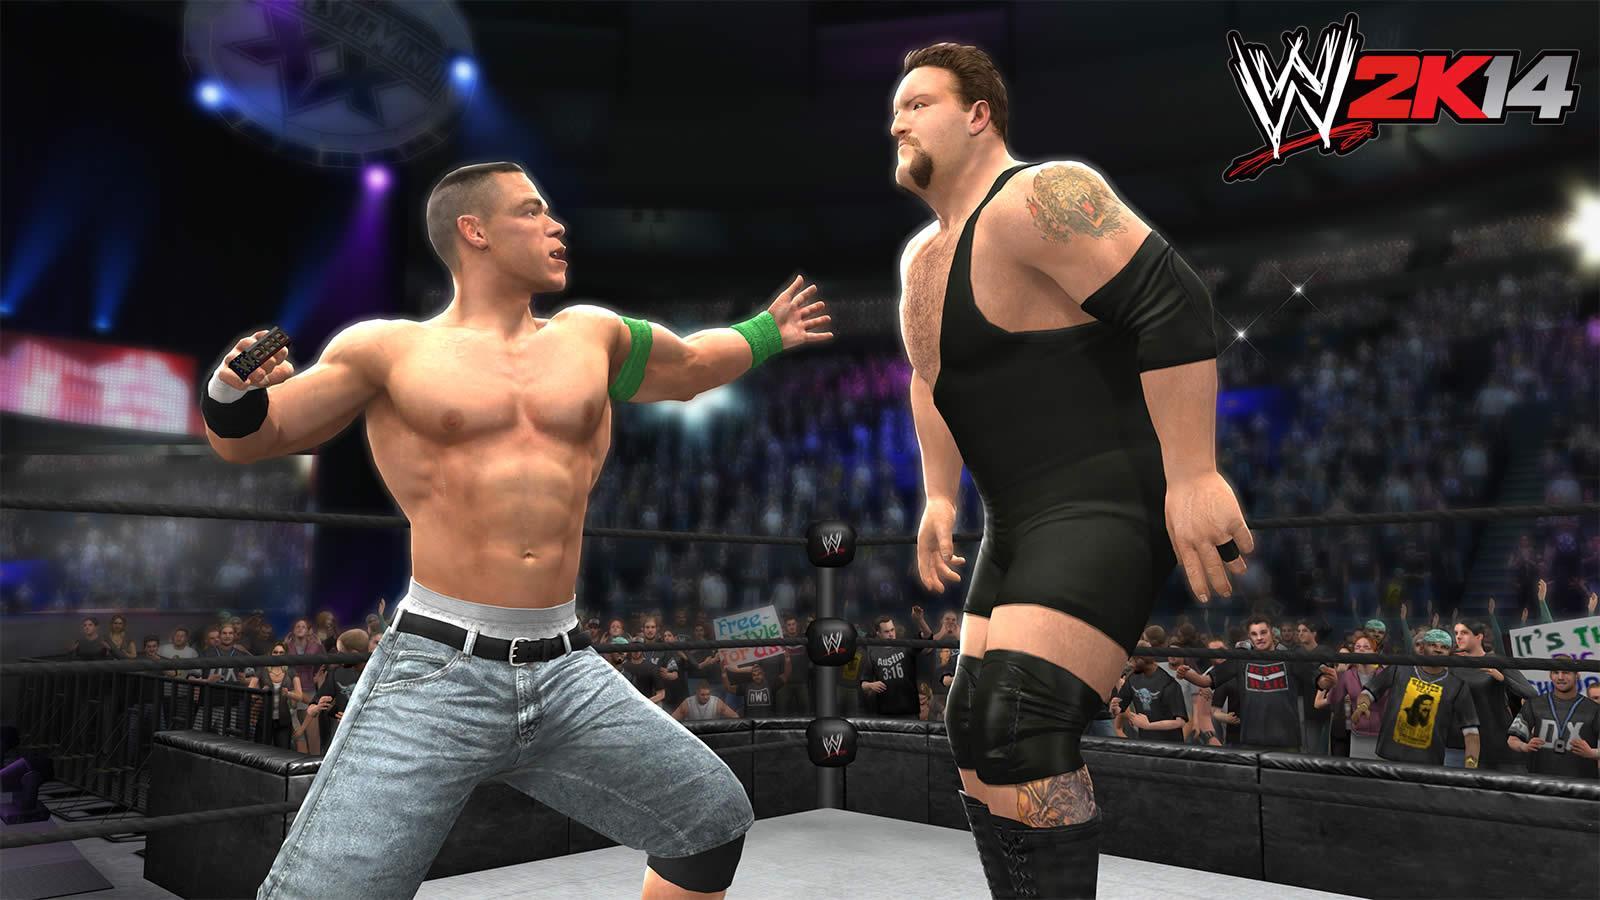 John cena vs rock 2013 full match free download